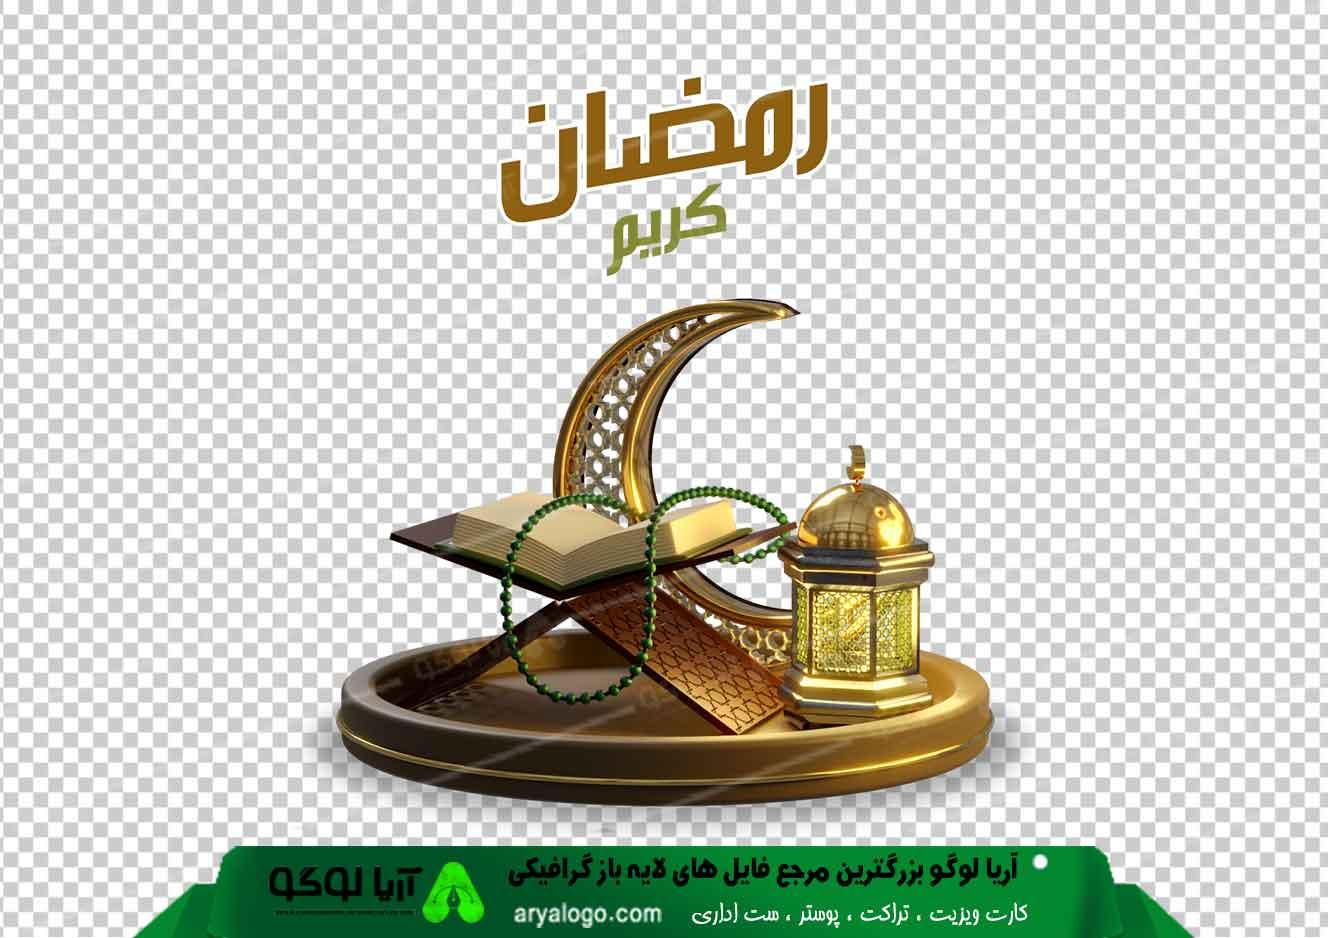 وکتور png ماه رمضان 10